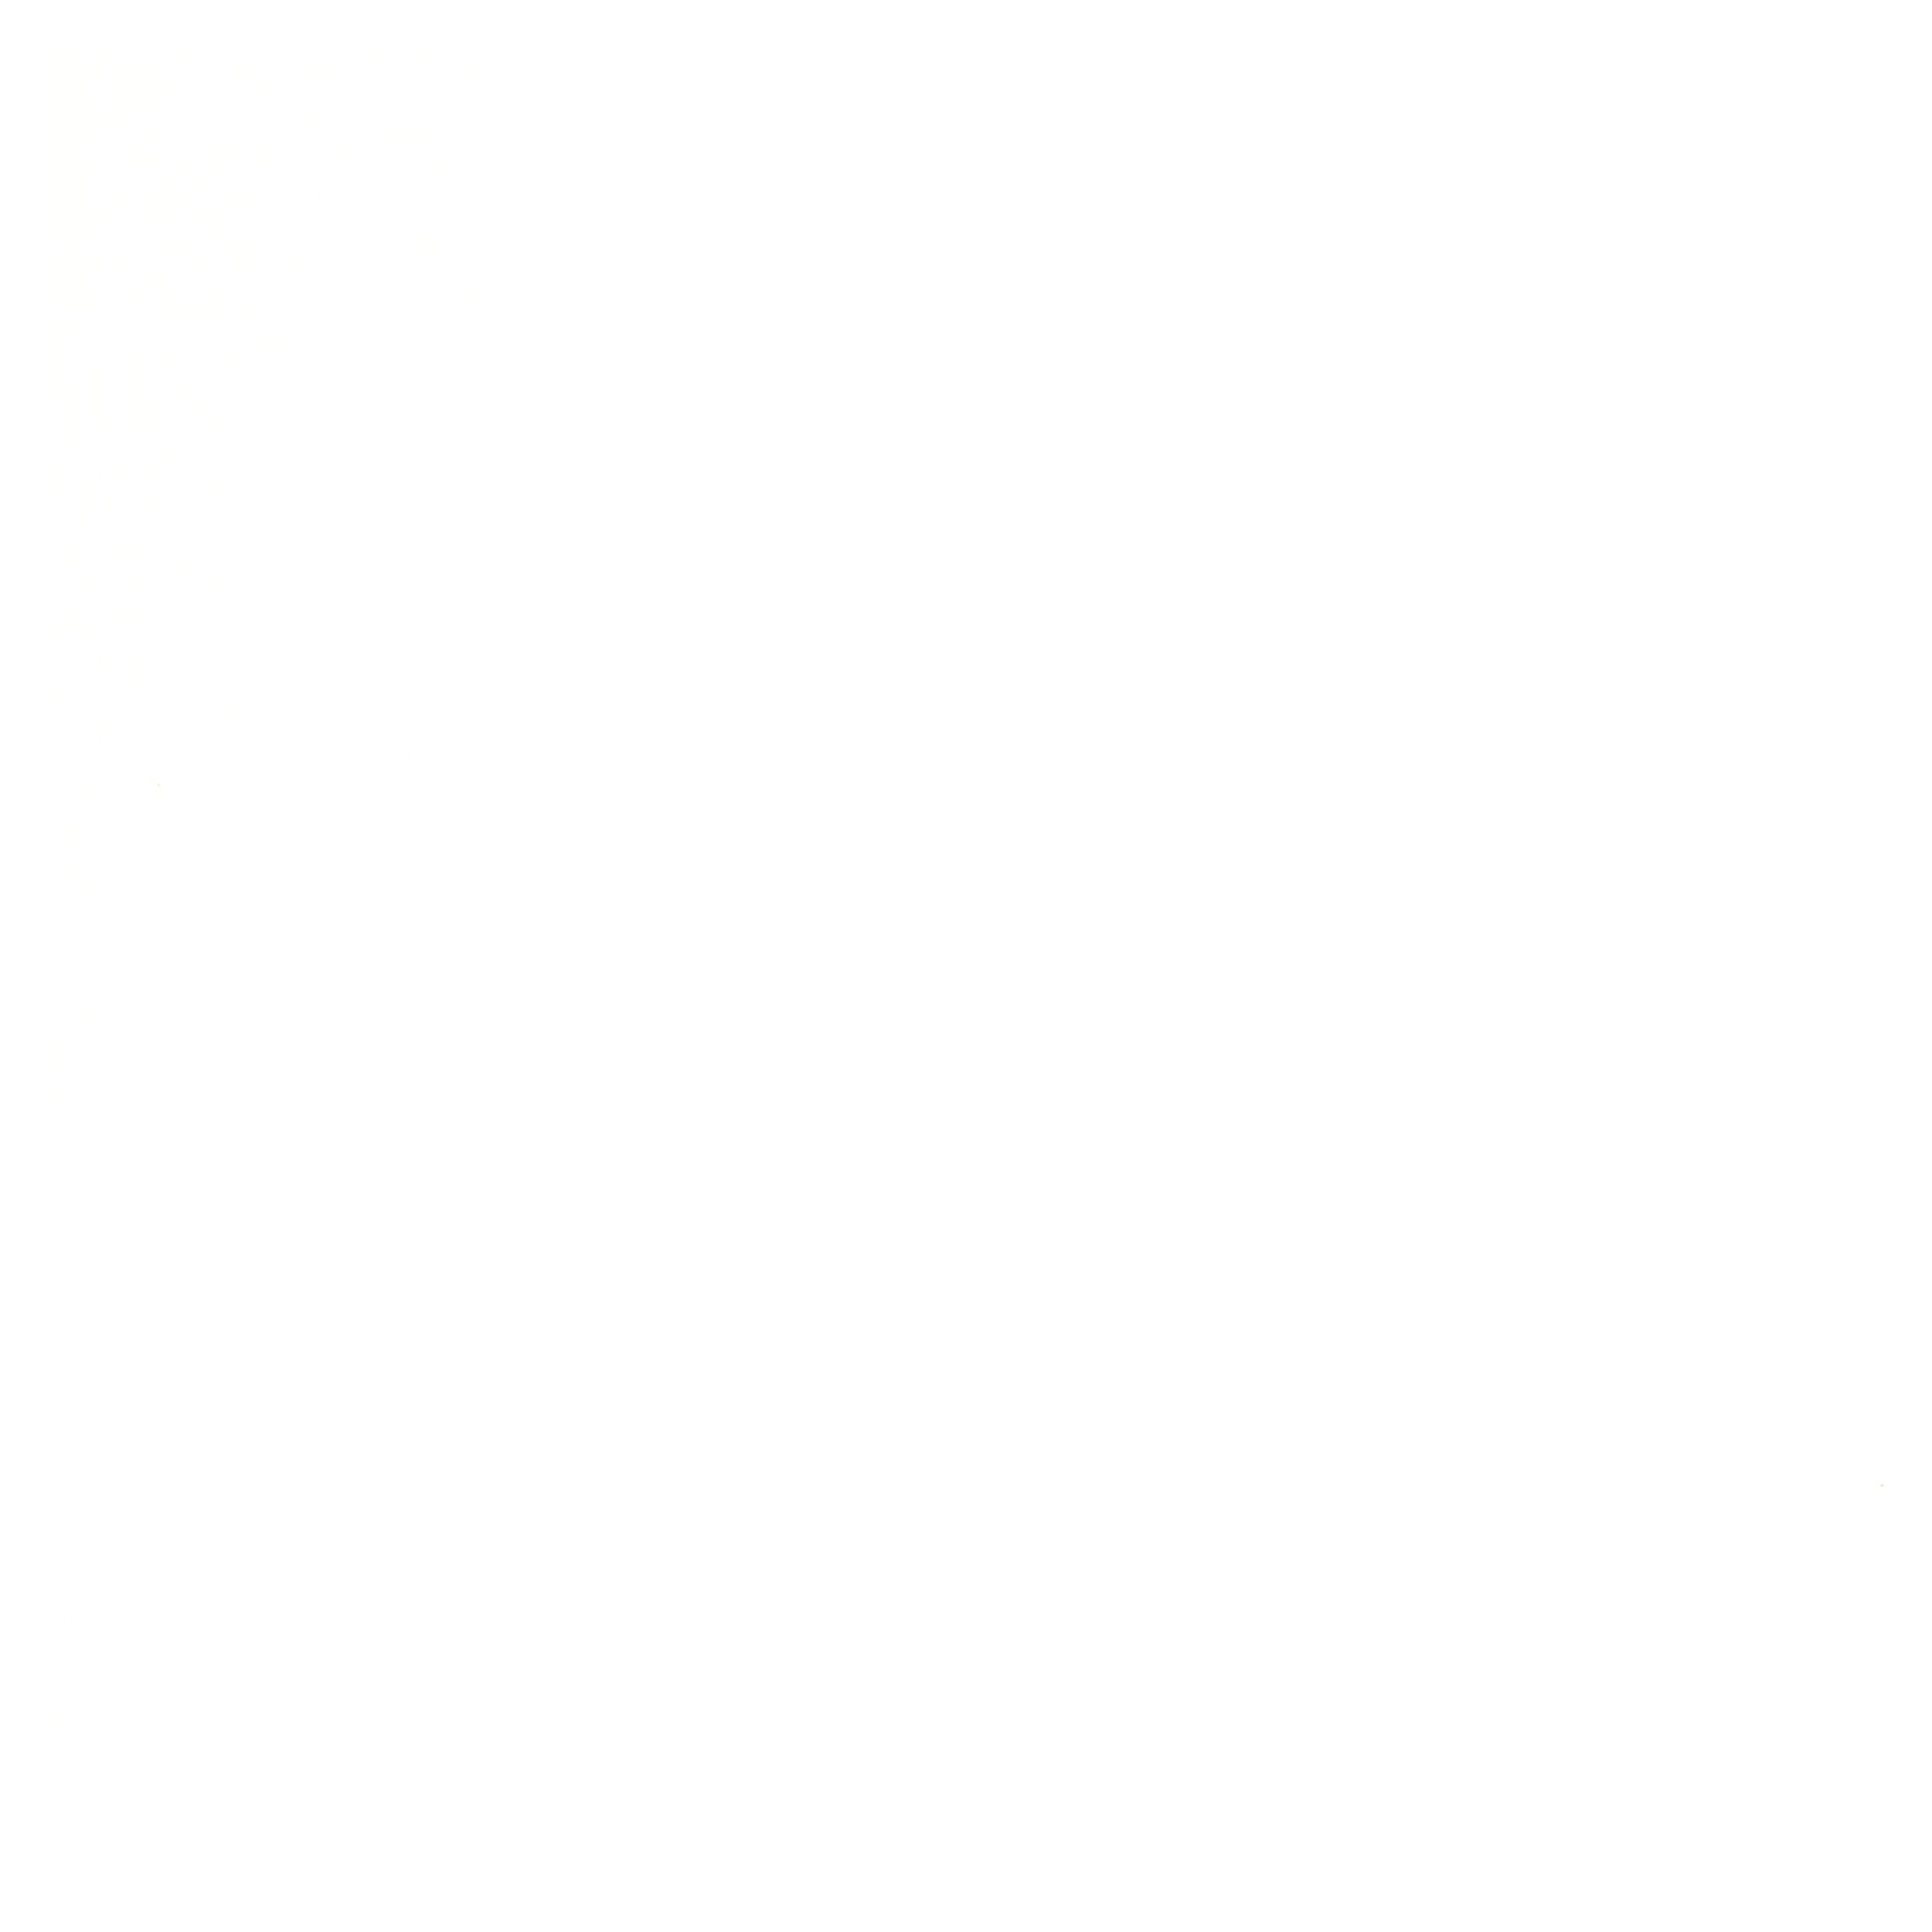 Dumawall+ wandtegel kunststof wit per 1,95m²